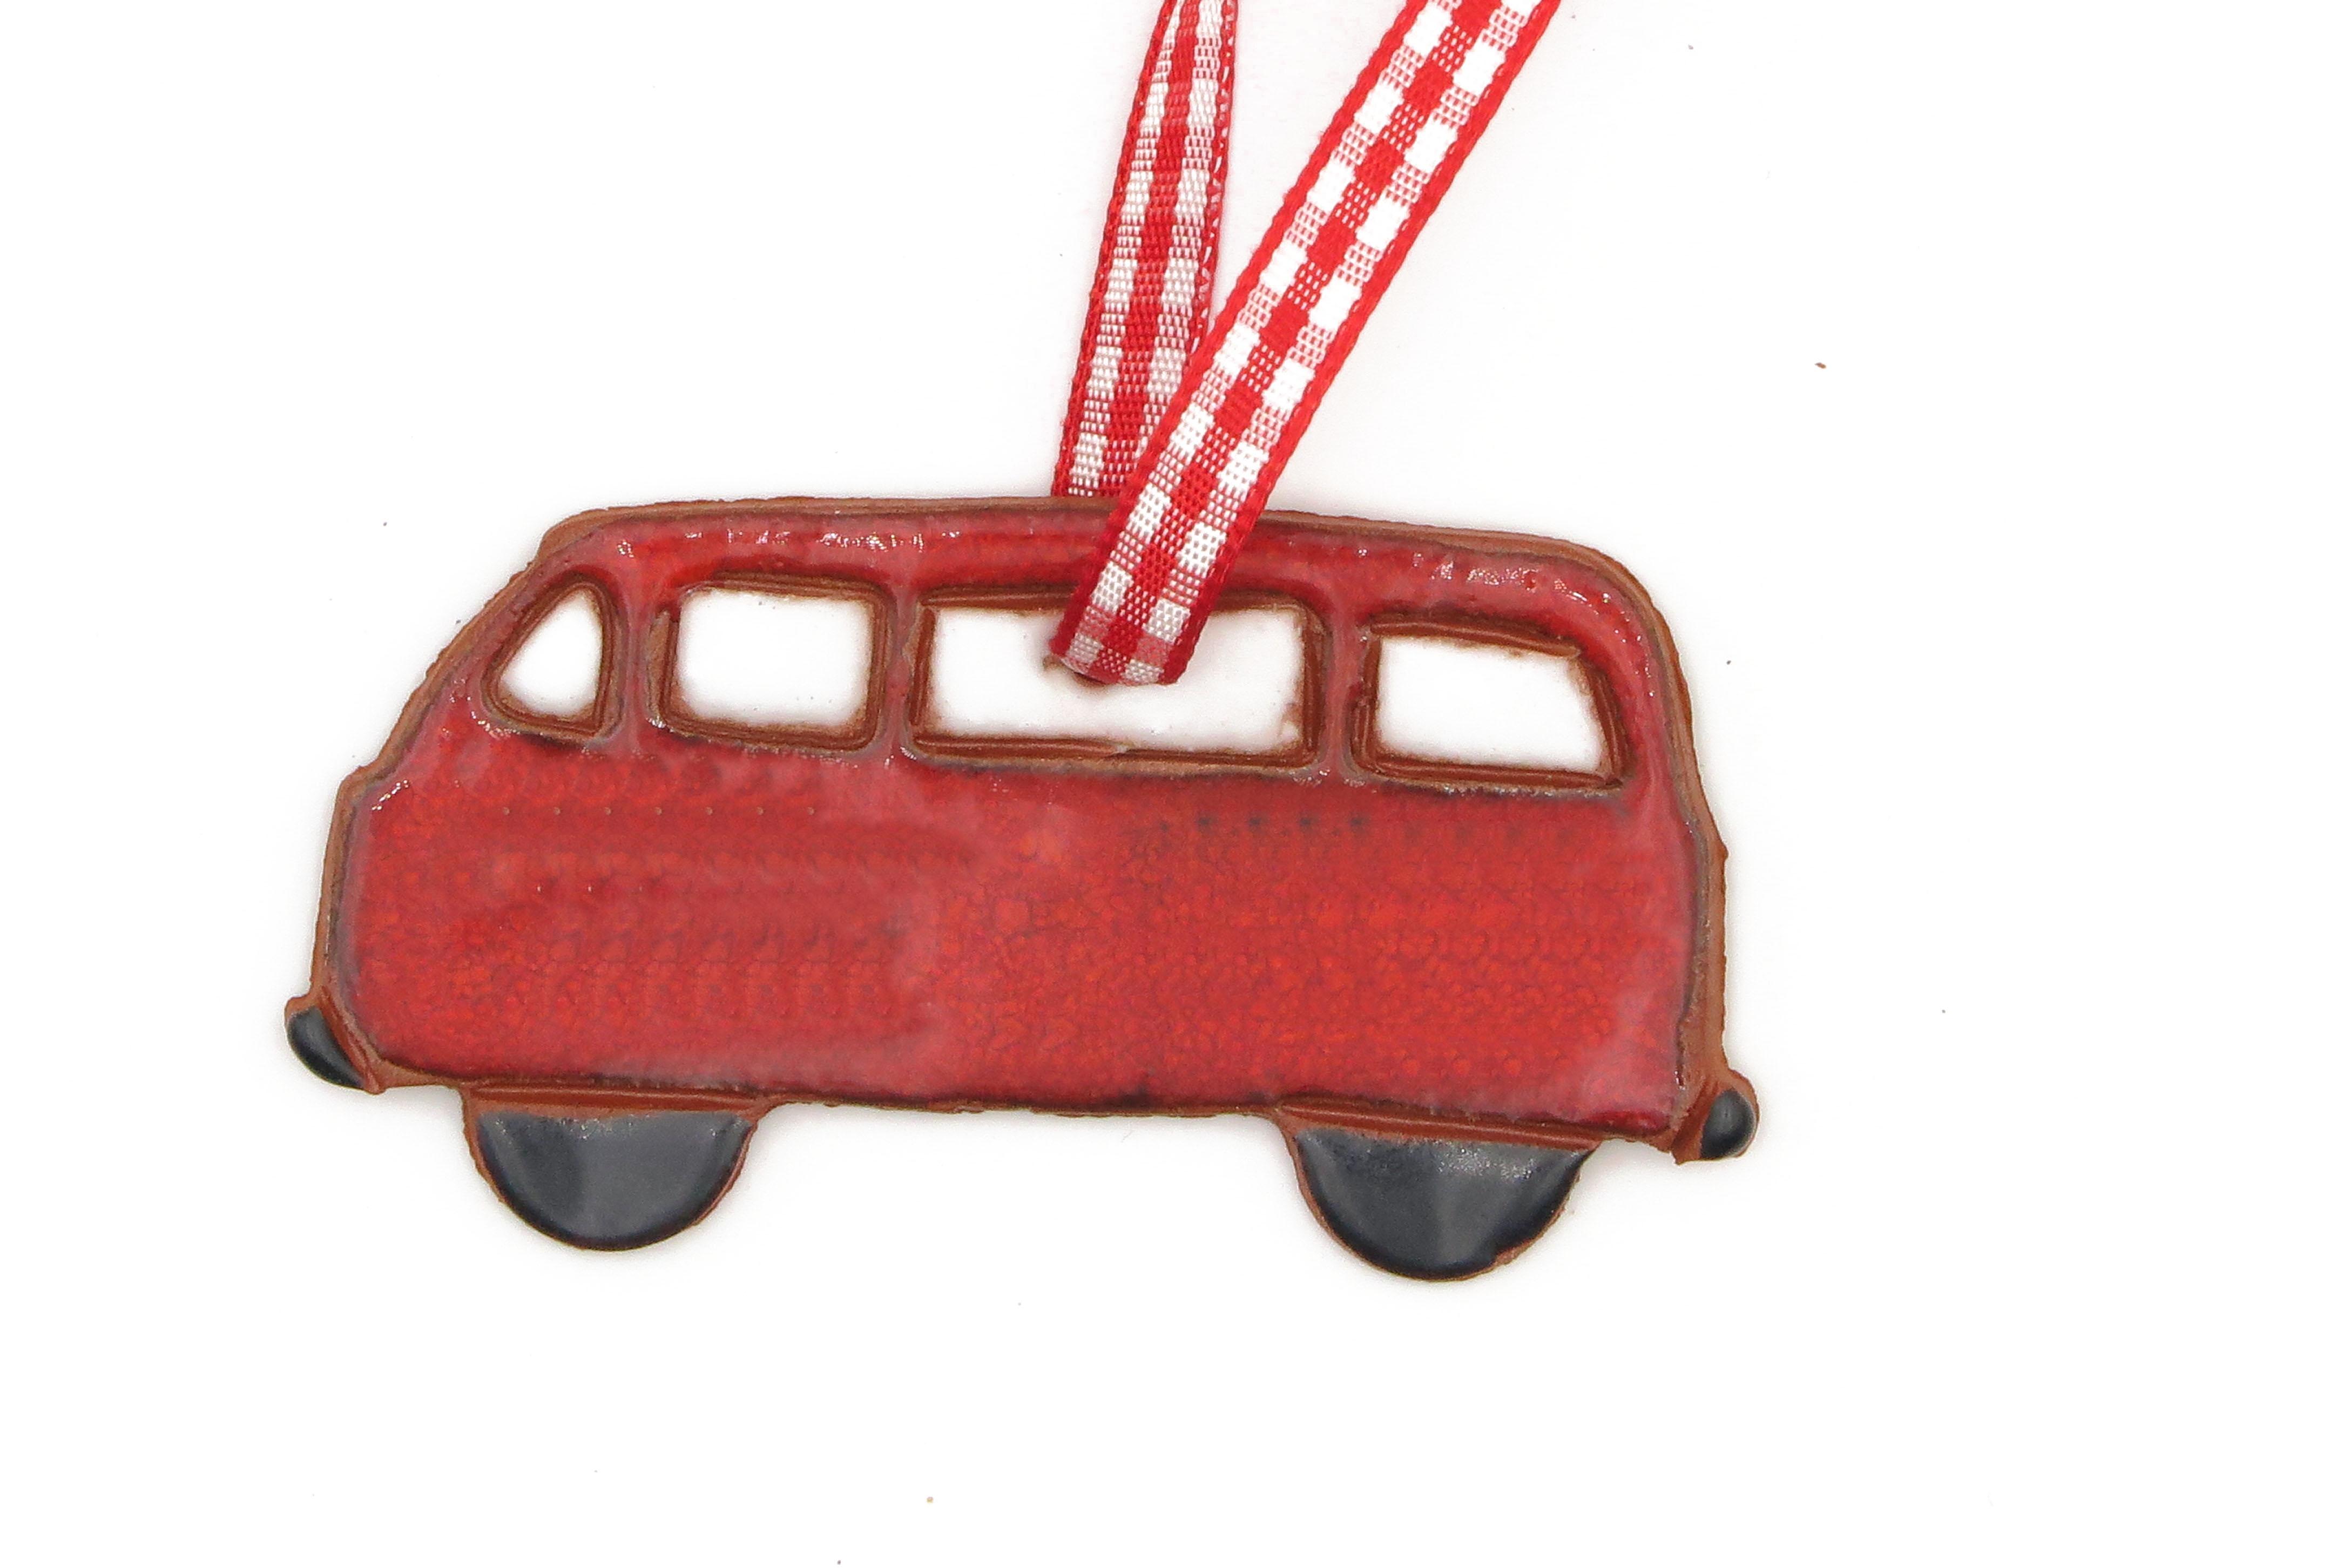 Bulli Bus Geschenk Anhänger Keramik Weihnachten rot/ M 7cm